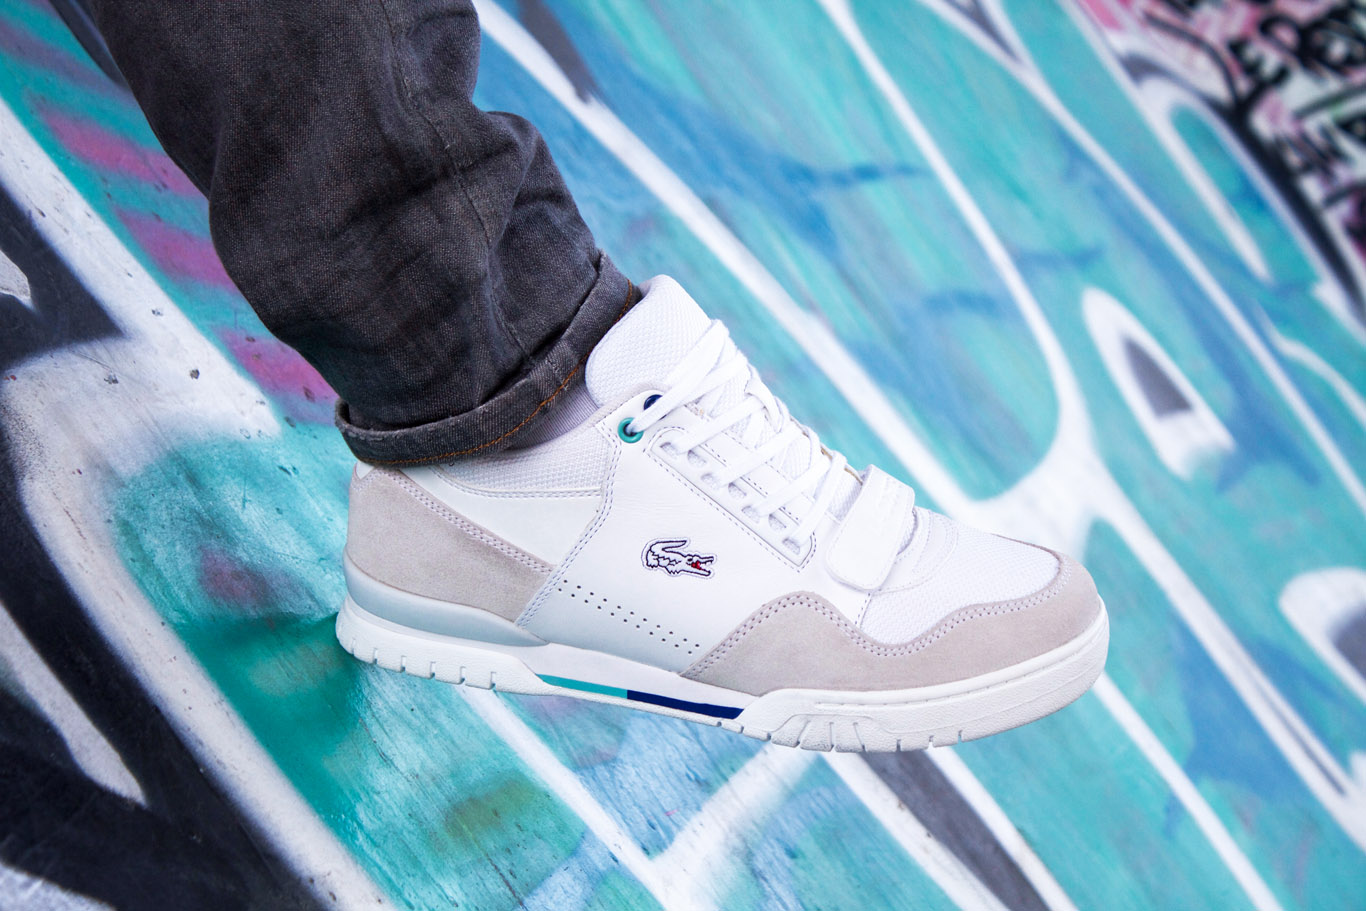 Sneakers Lacoste Missouri G117 - SPORT WHITE